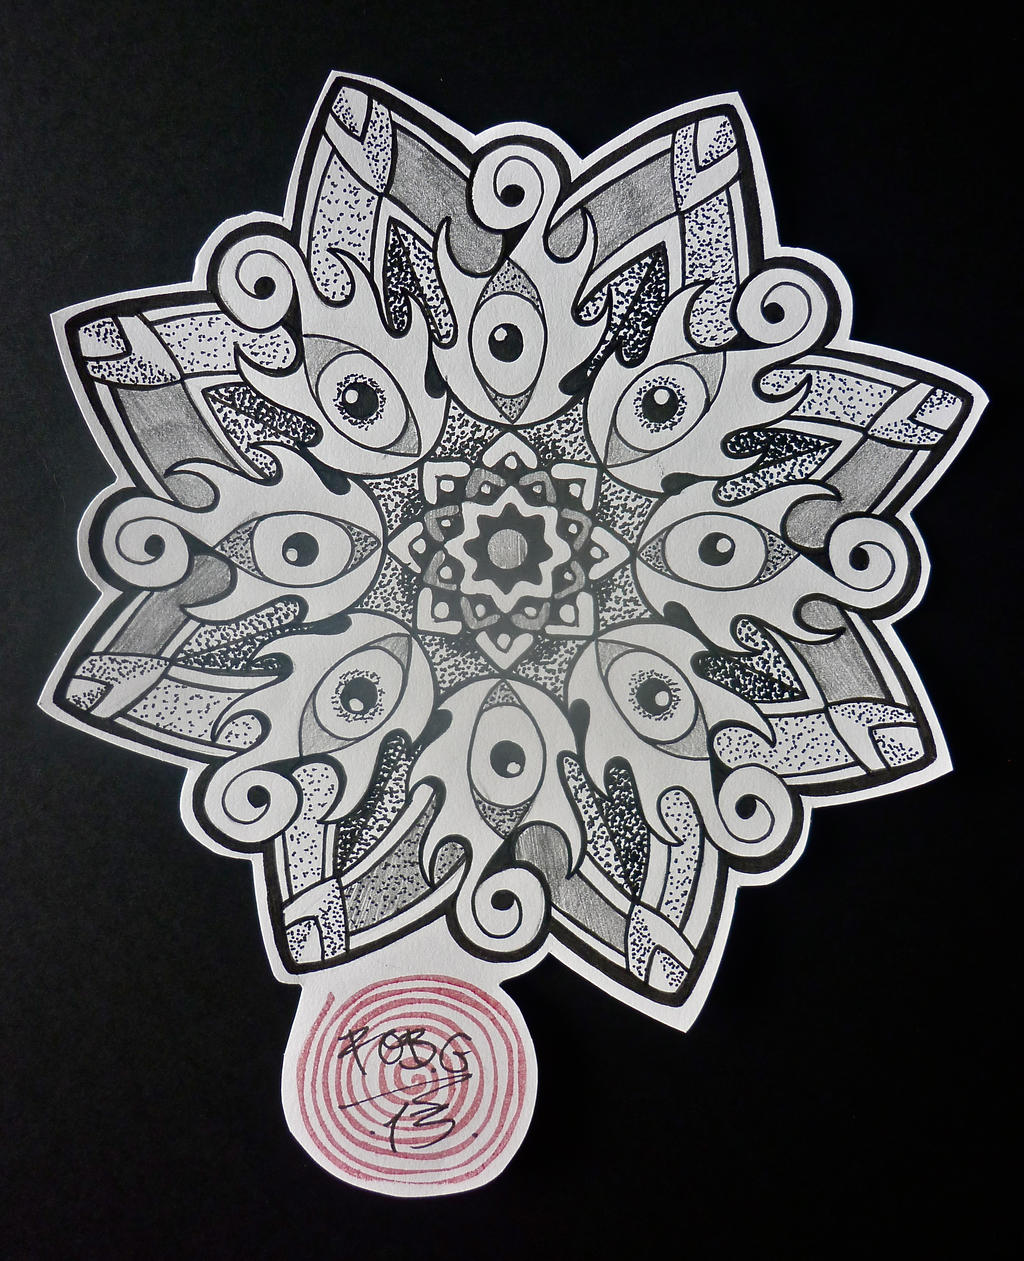 the gallery for gt third eye chakra mandala tattoo